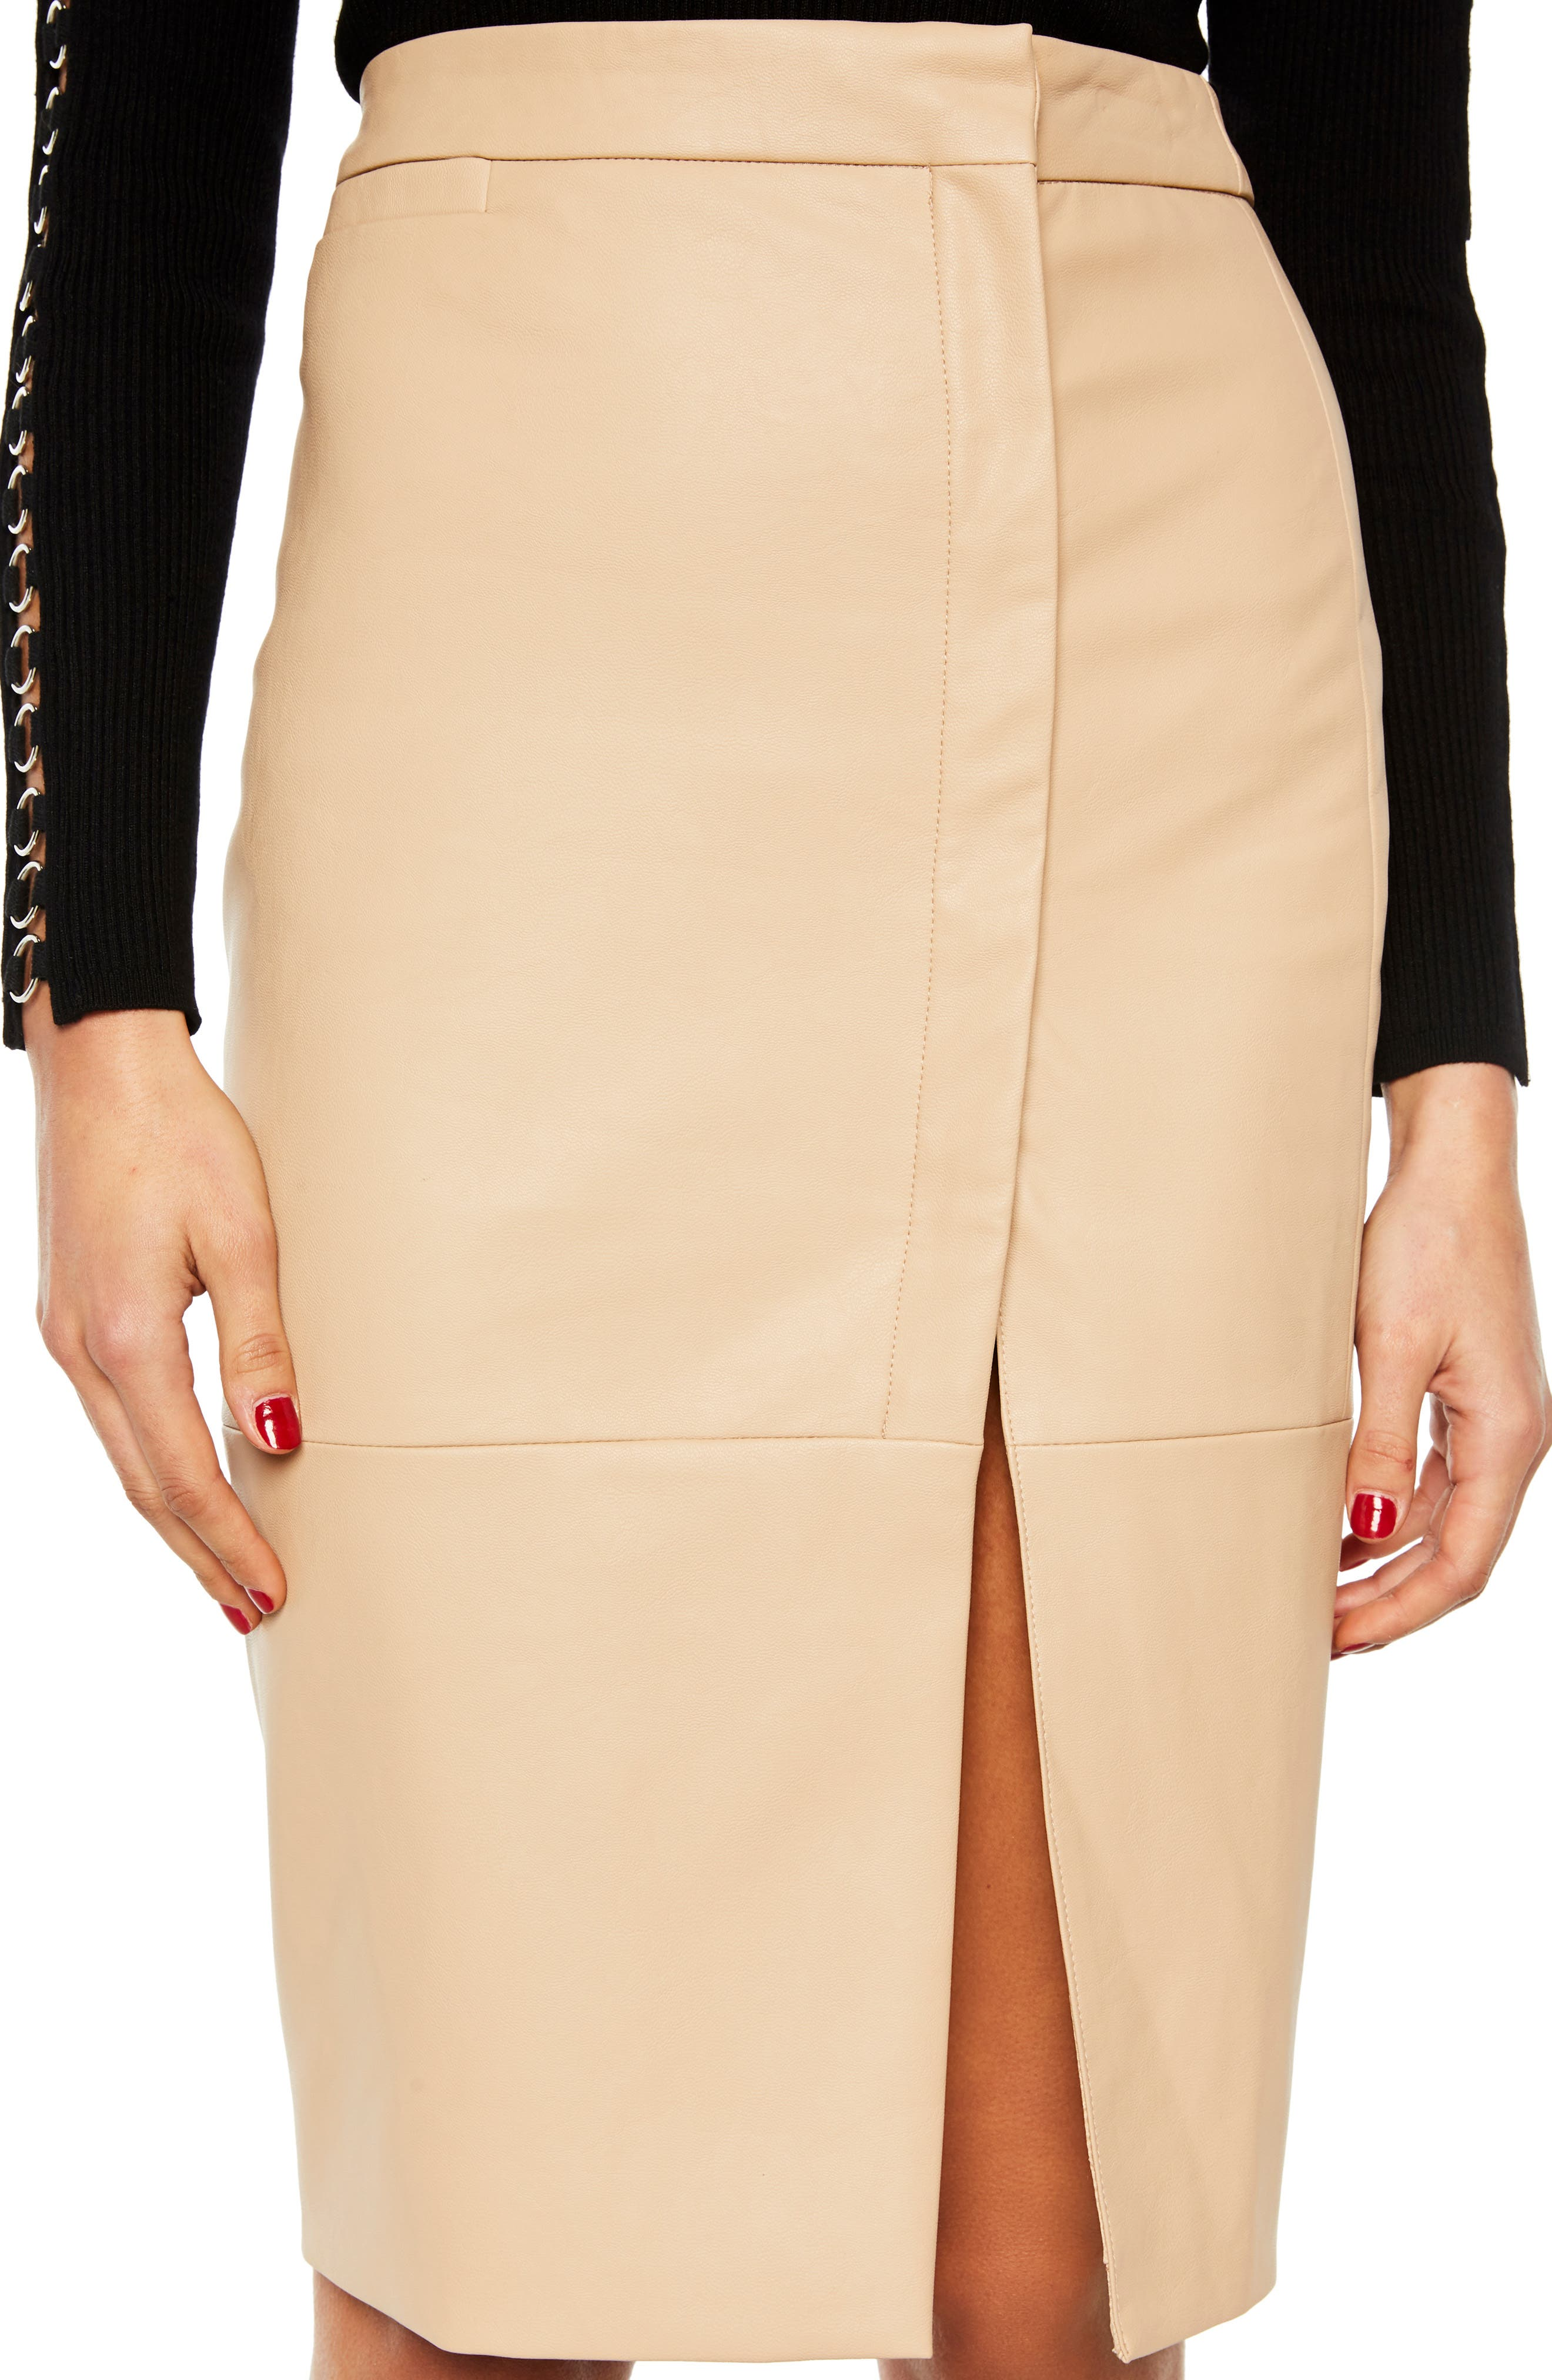 Dee Faux Leather Pencil Skirt,                             Alternate thumbnail 4, color,                             250